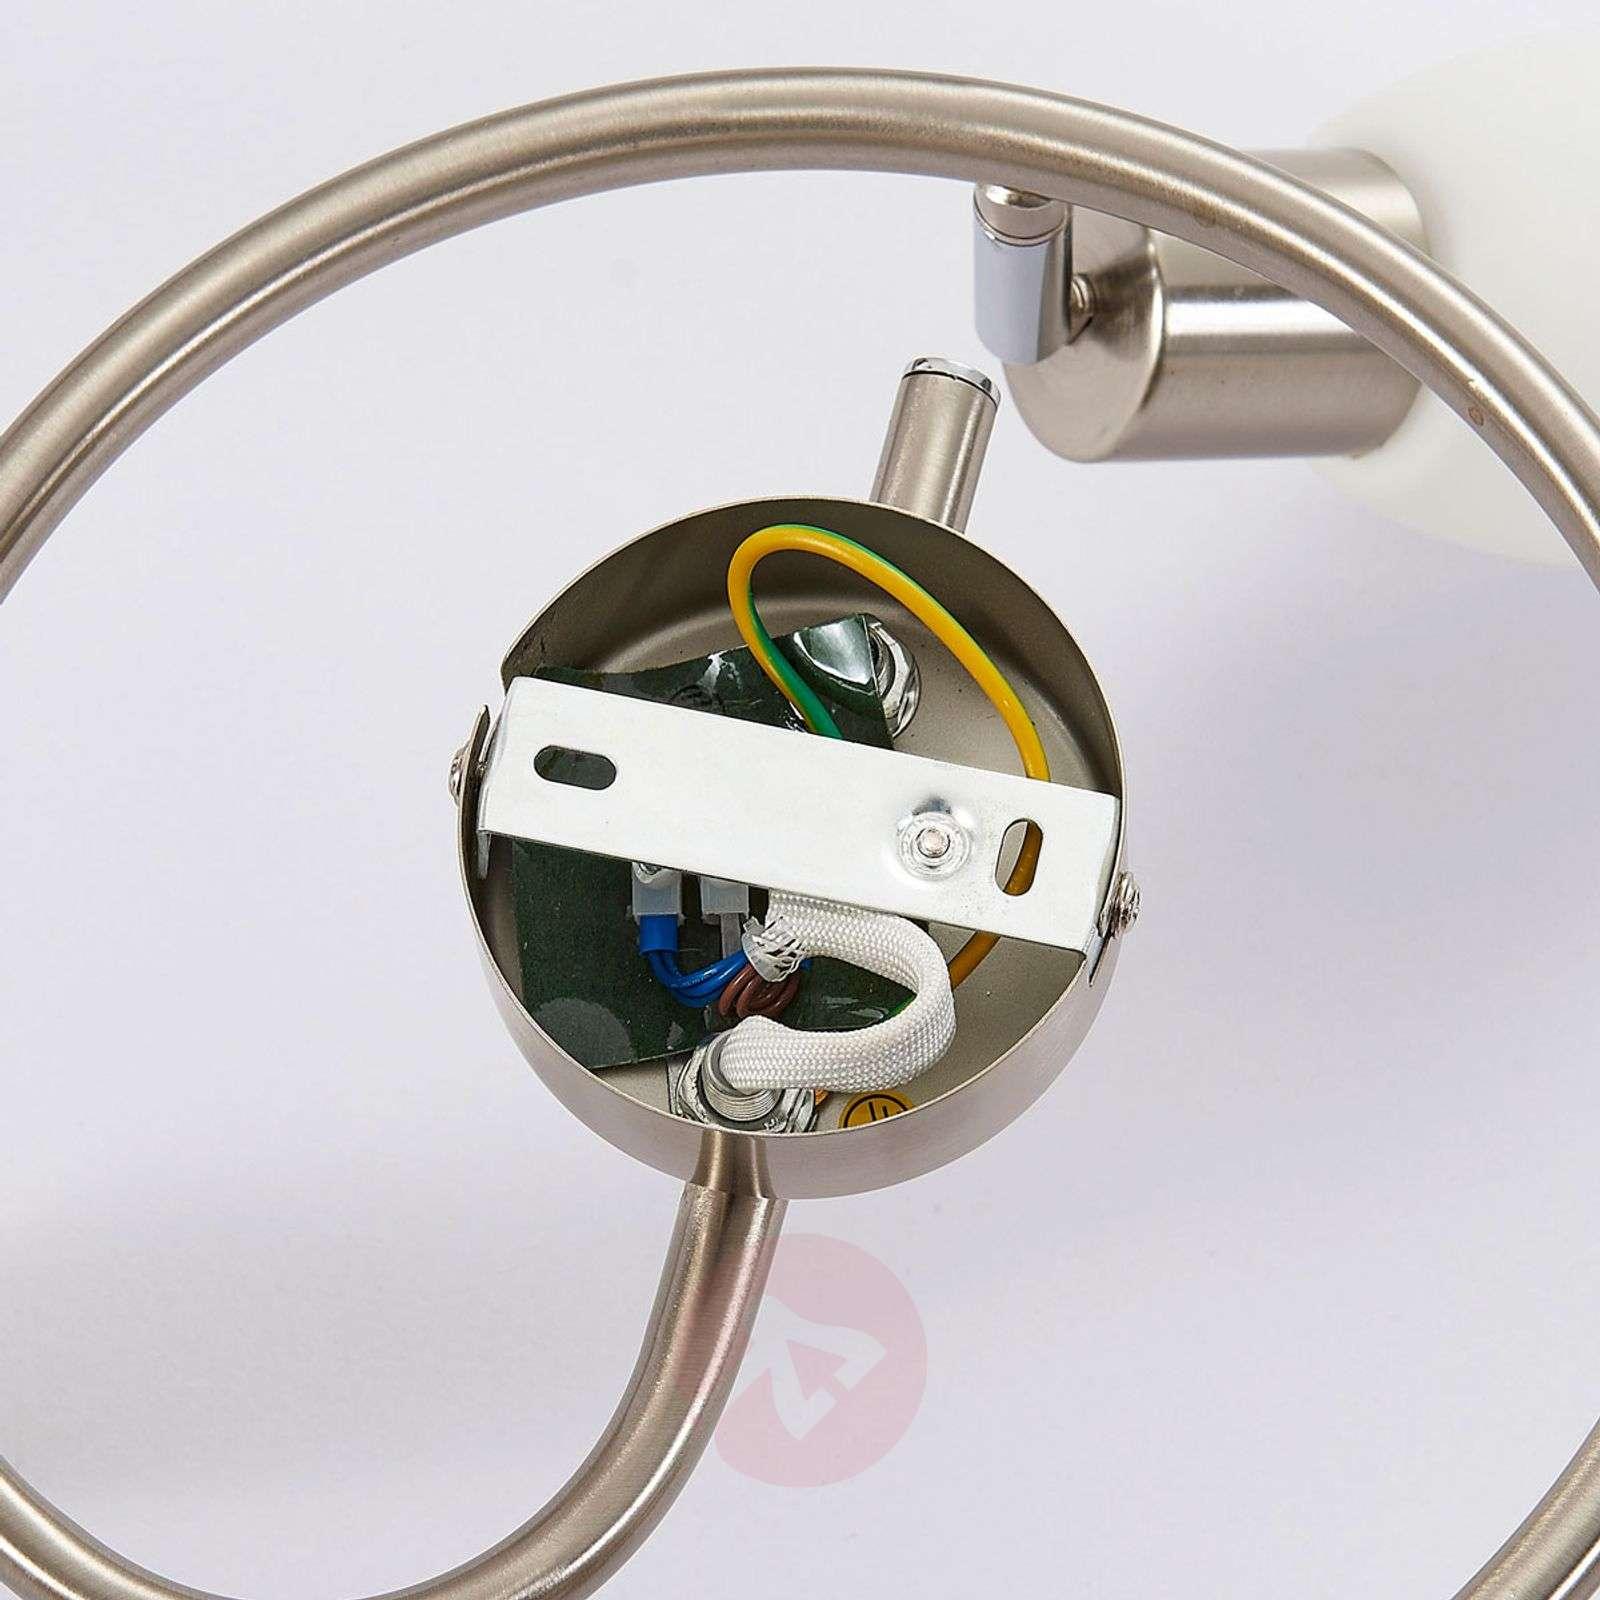 Easydim-LED-kattorondell Arda, 3 lamppua-9621266-02